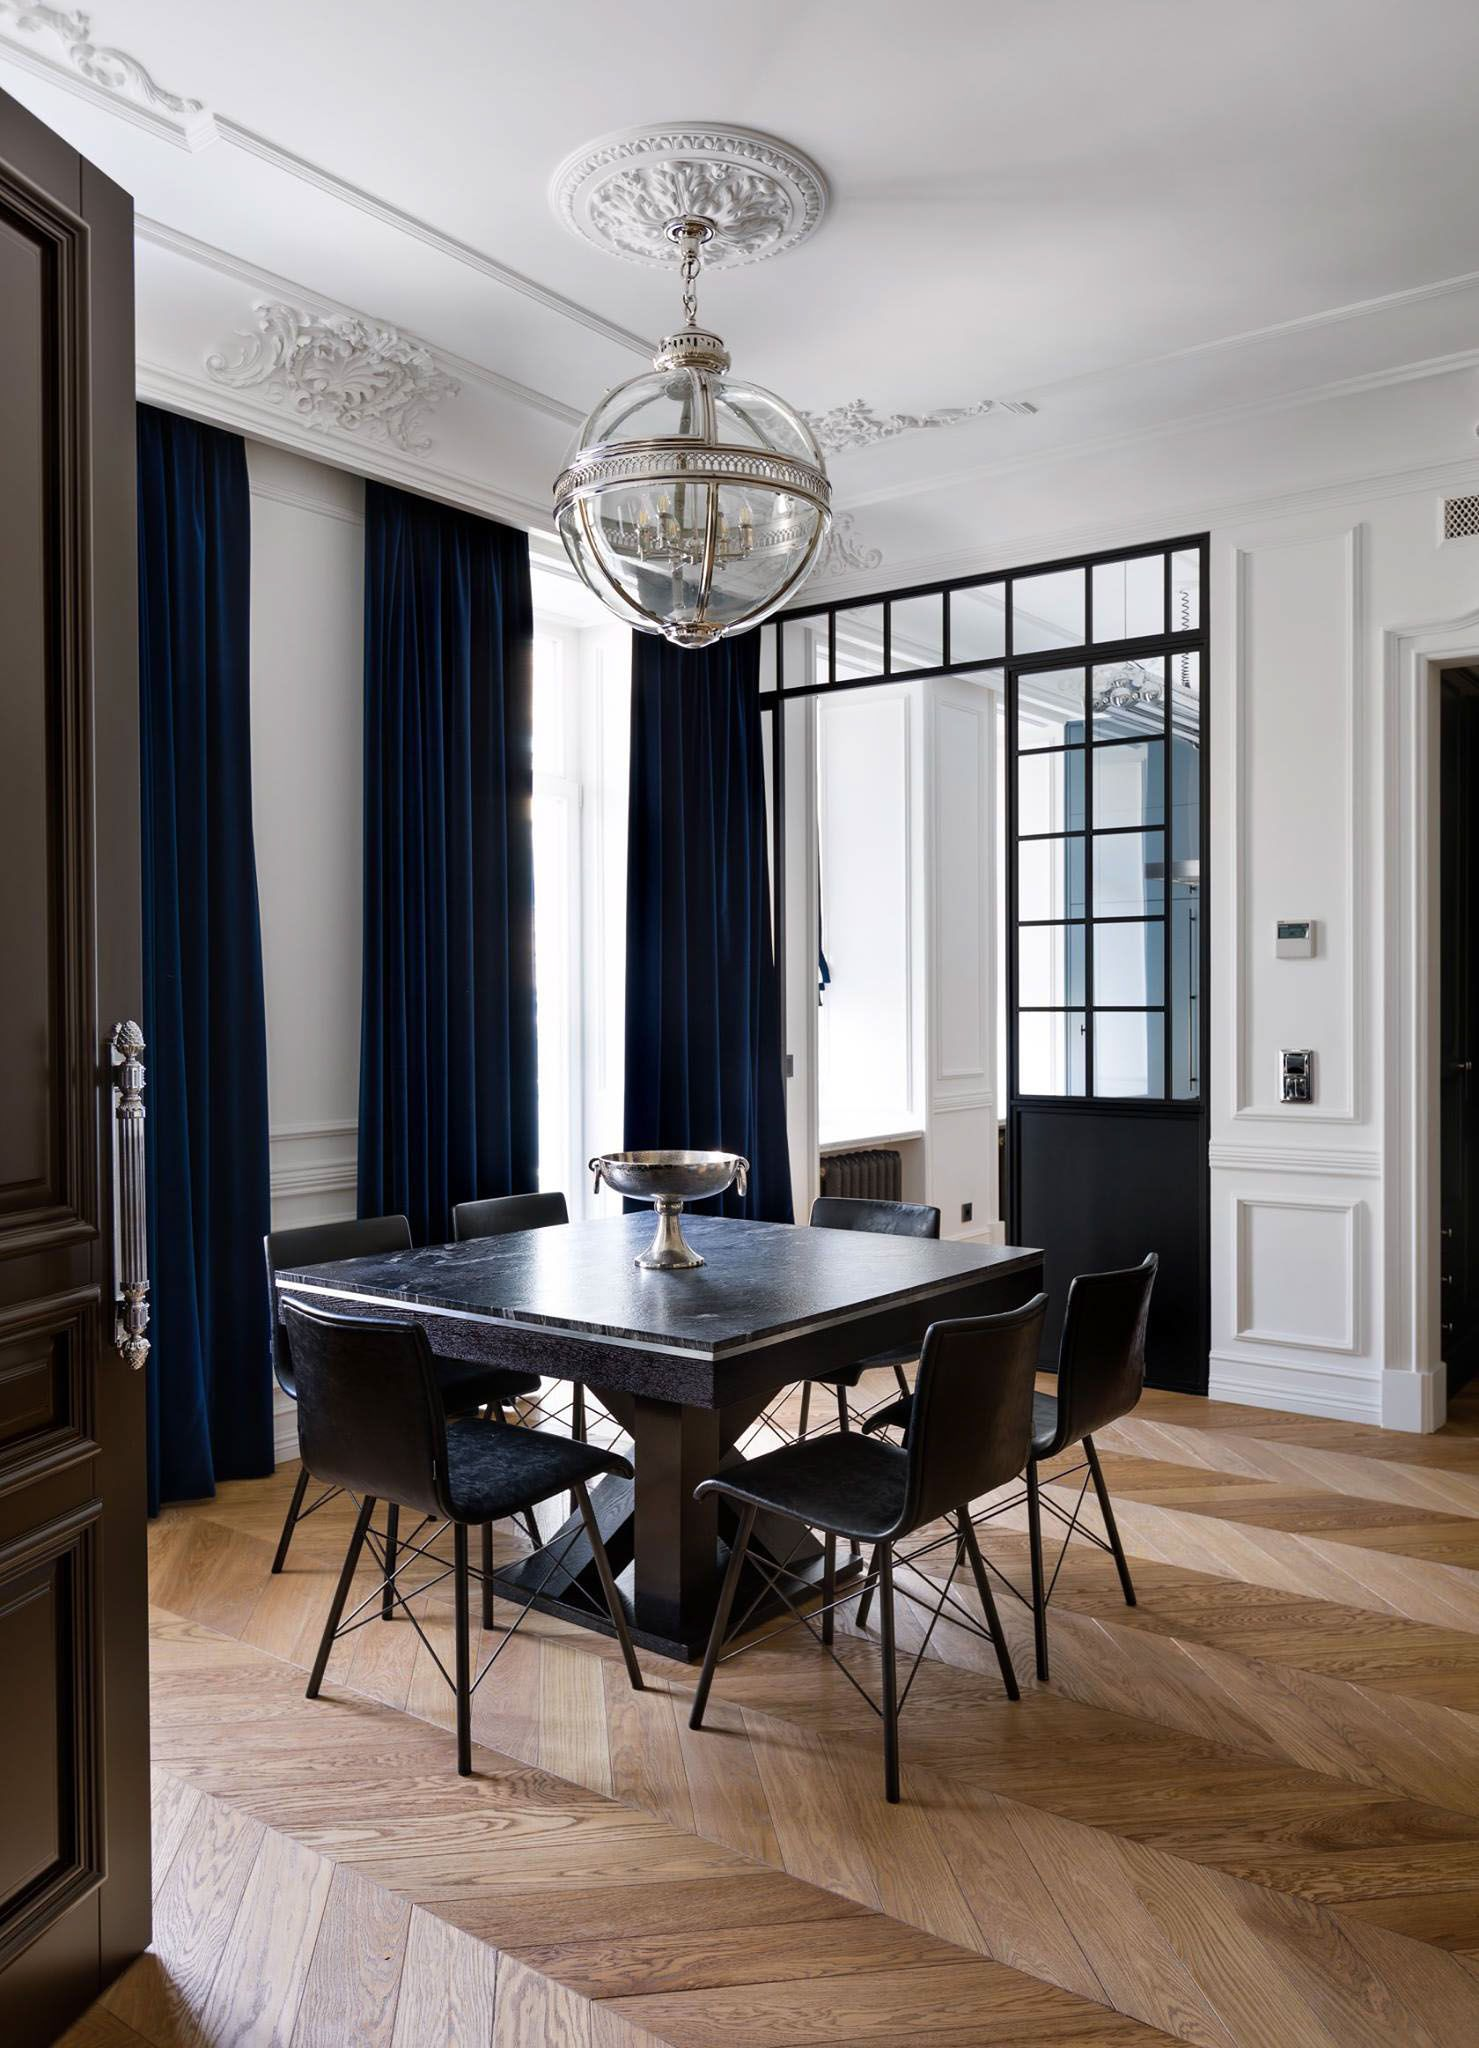 Apartment In Kyiv Center On Behance Interior Neoclassical Interior Interior Design